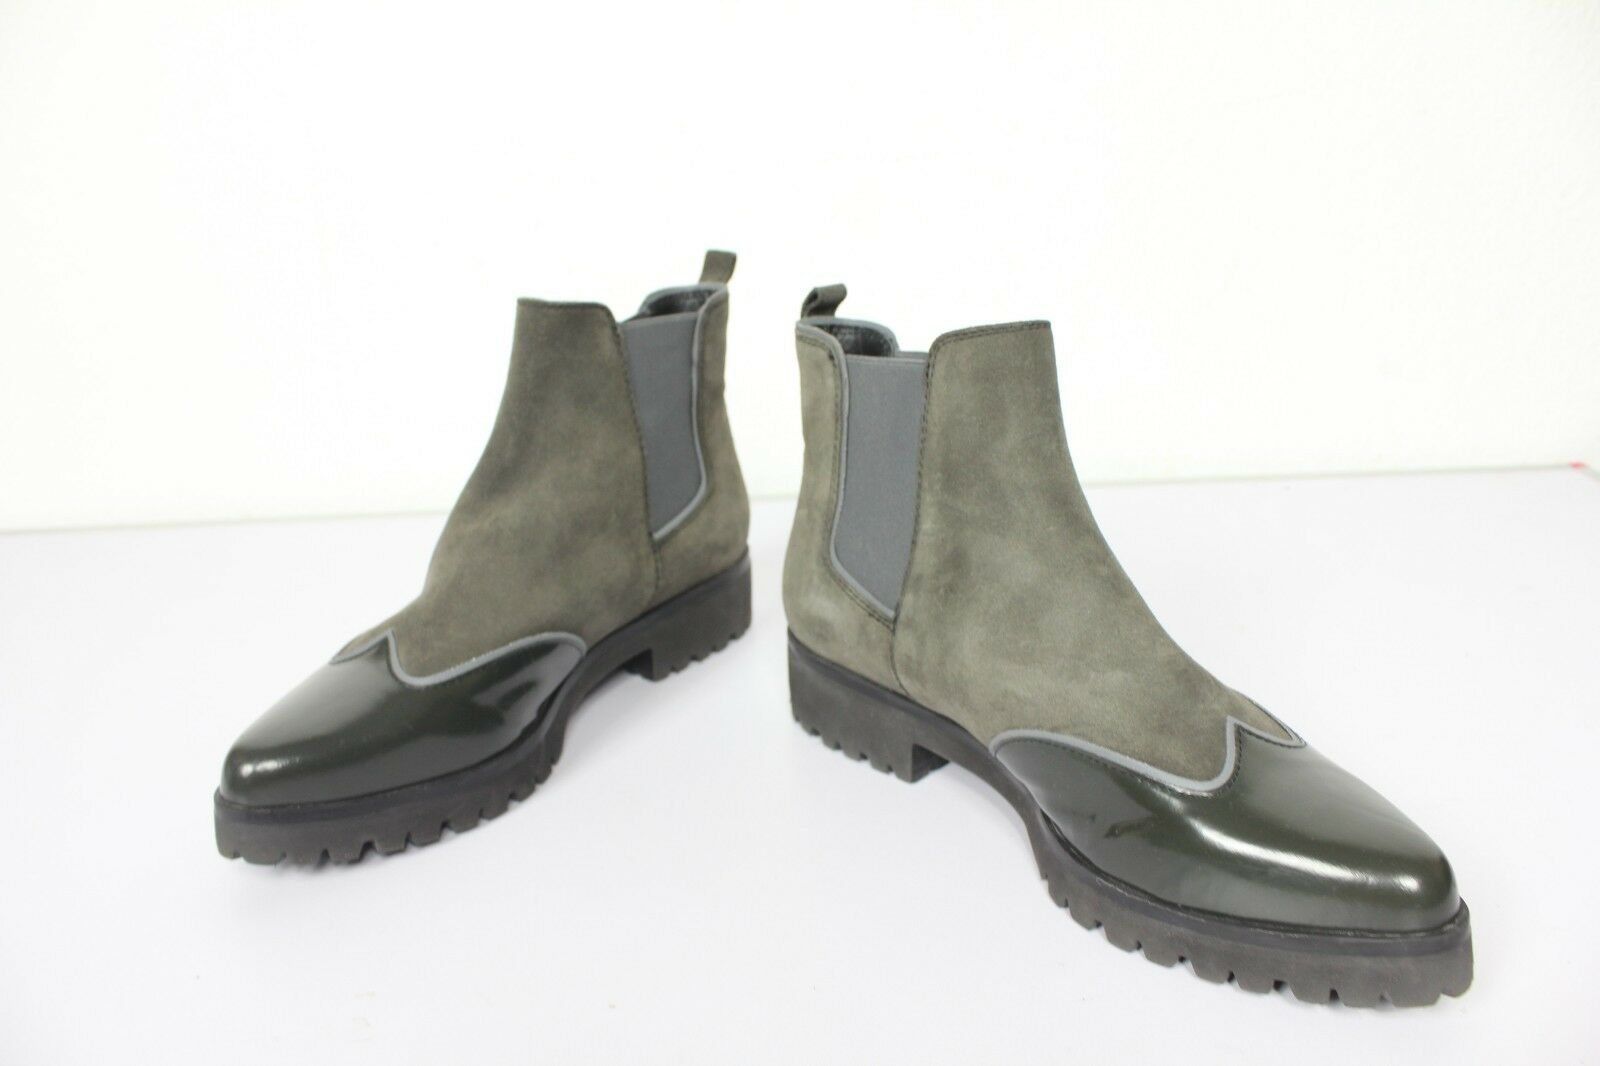 Geox Respira elegante chelsea botas cuero genuino gris-verde tonos Mix eu 39 como nuevo